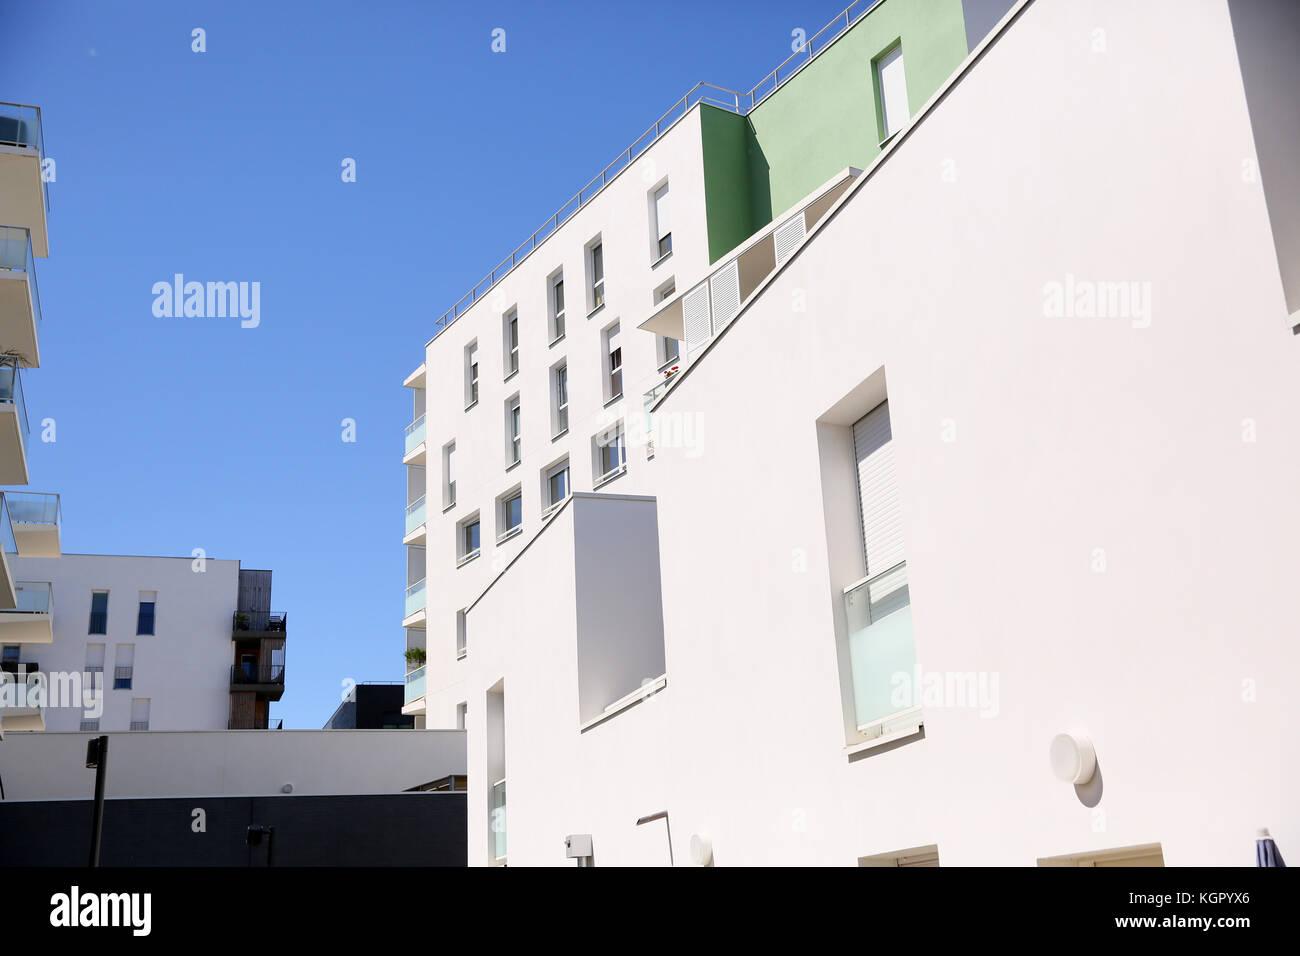 Closeup of modern buildings - Stock Image